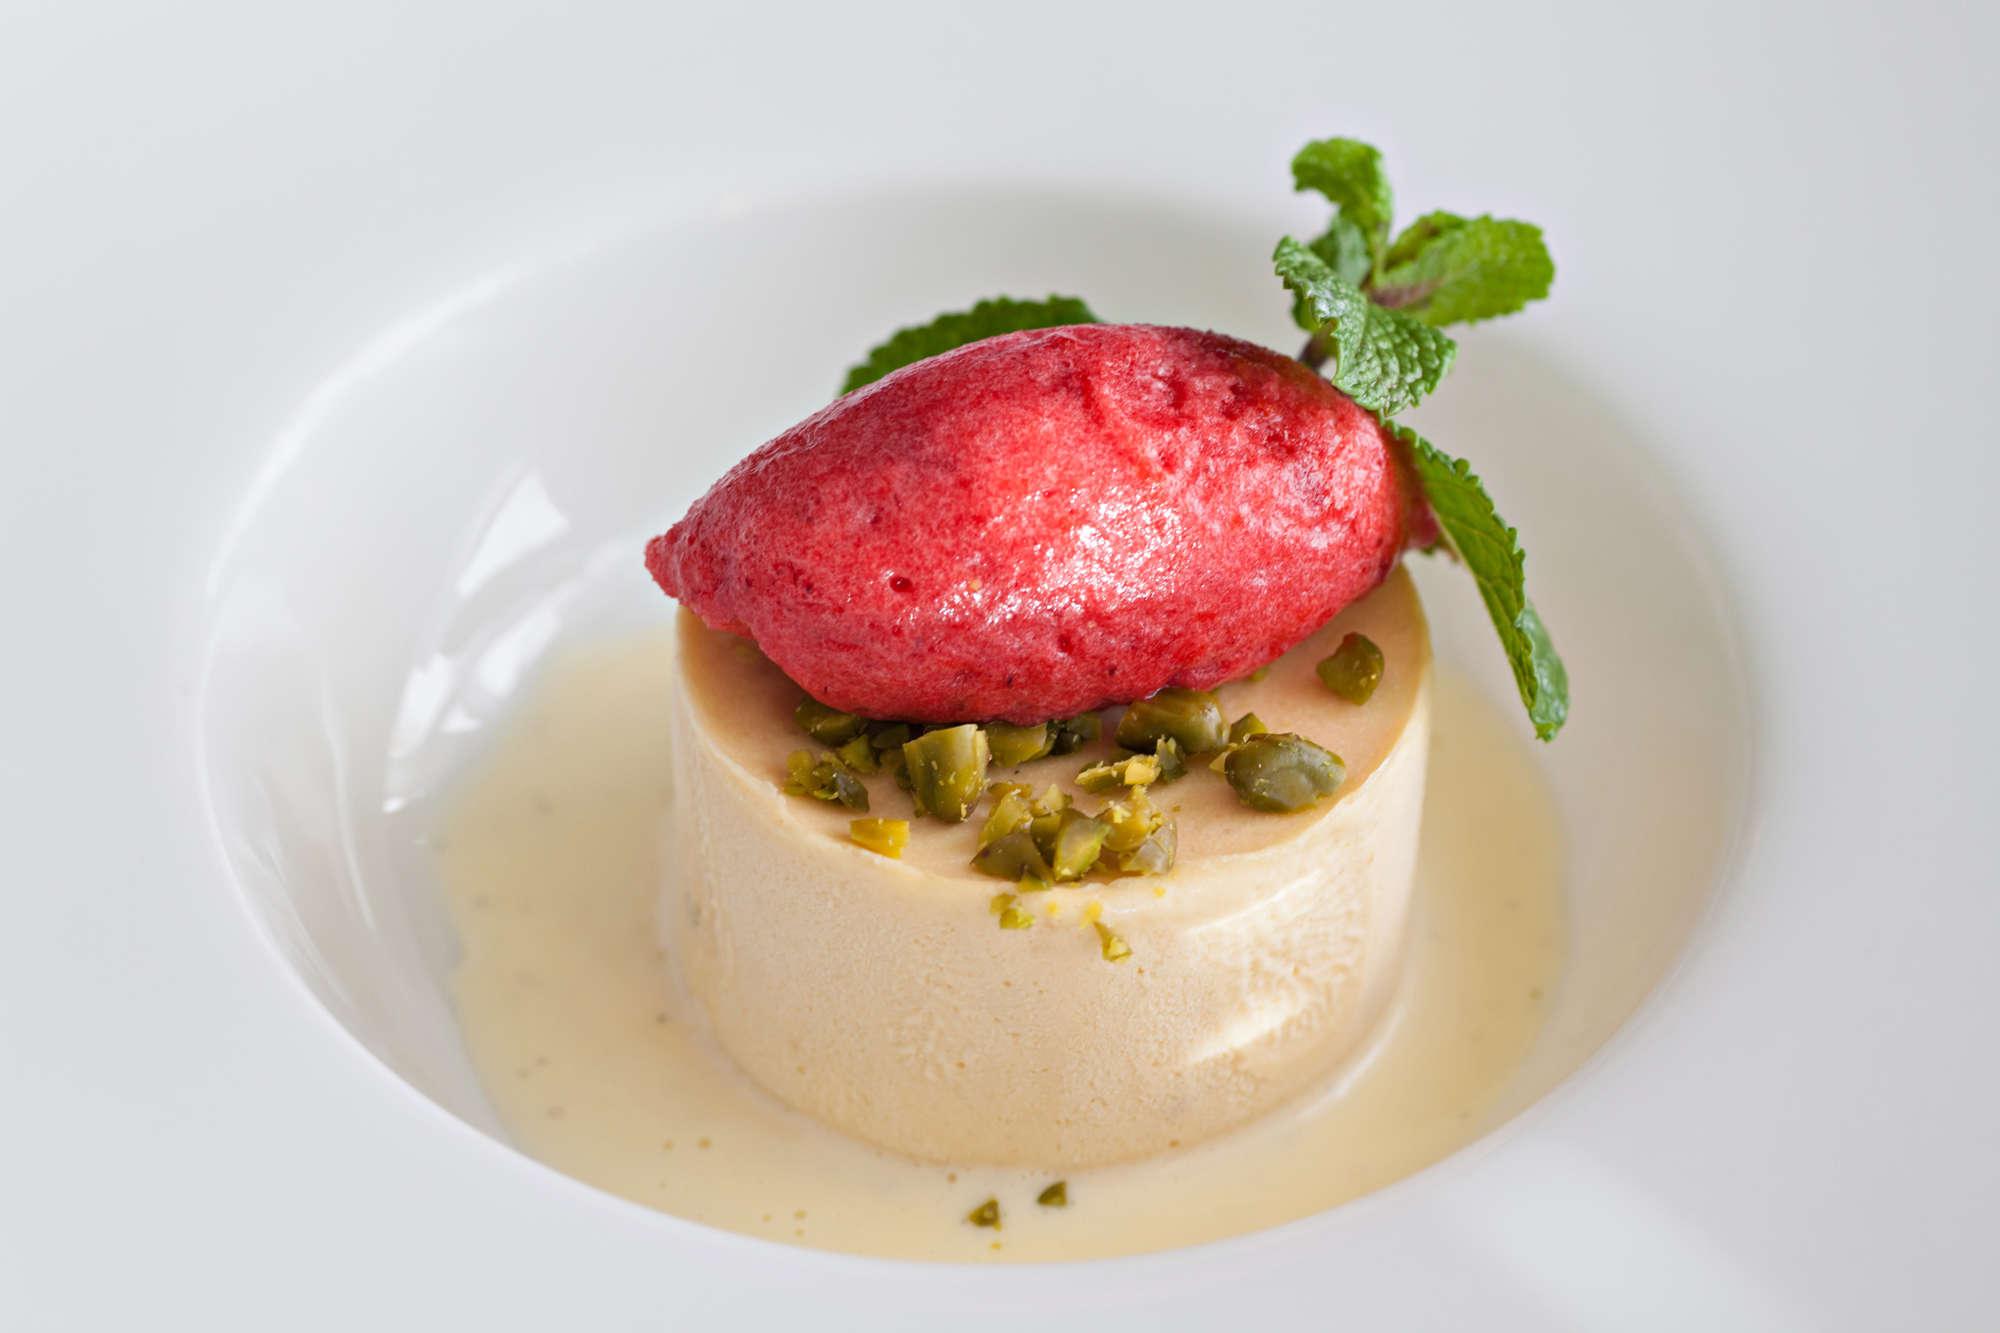 Peanut Parfait, Raspberry sorbet, crushed pistachio